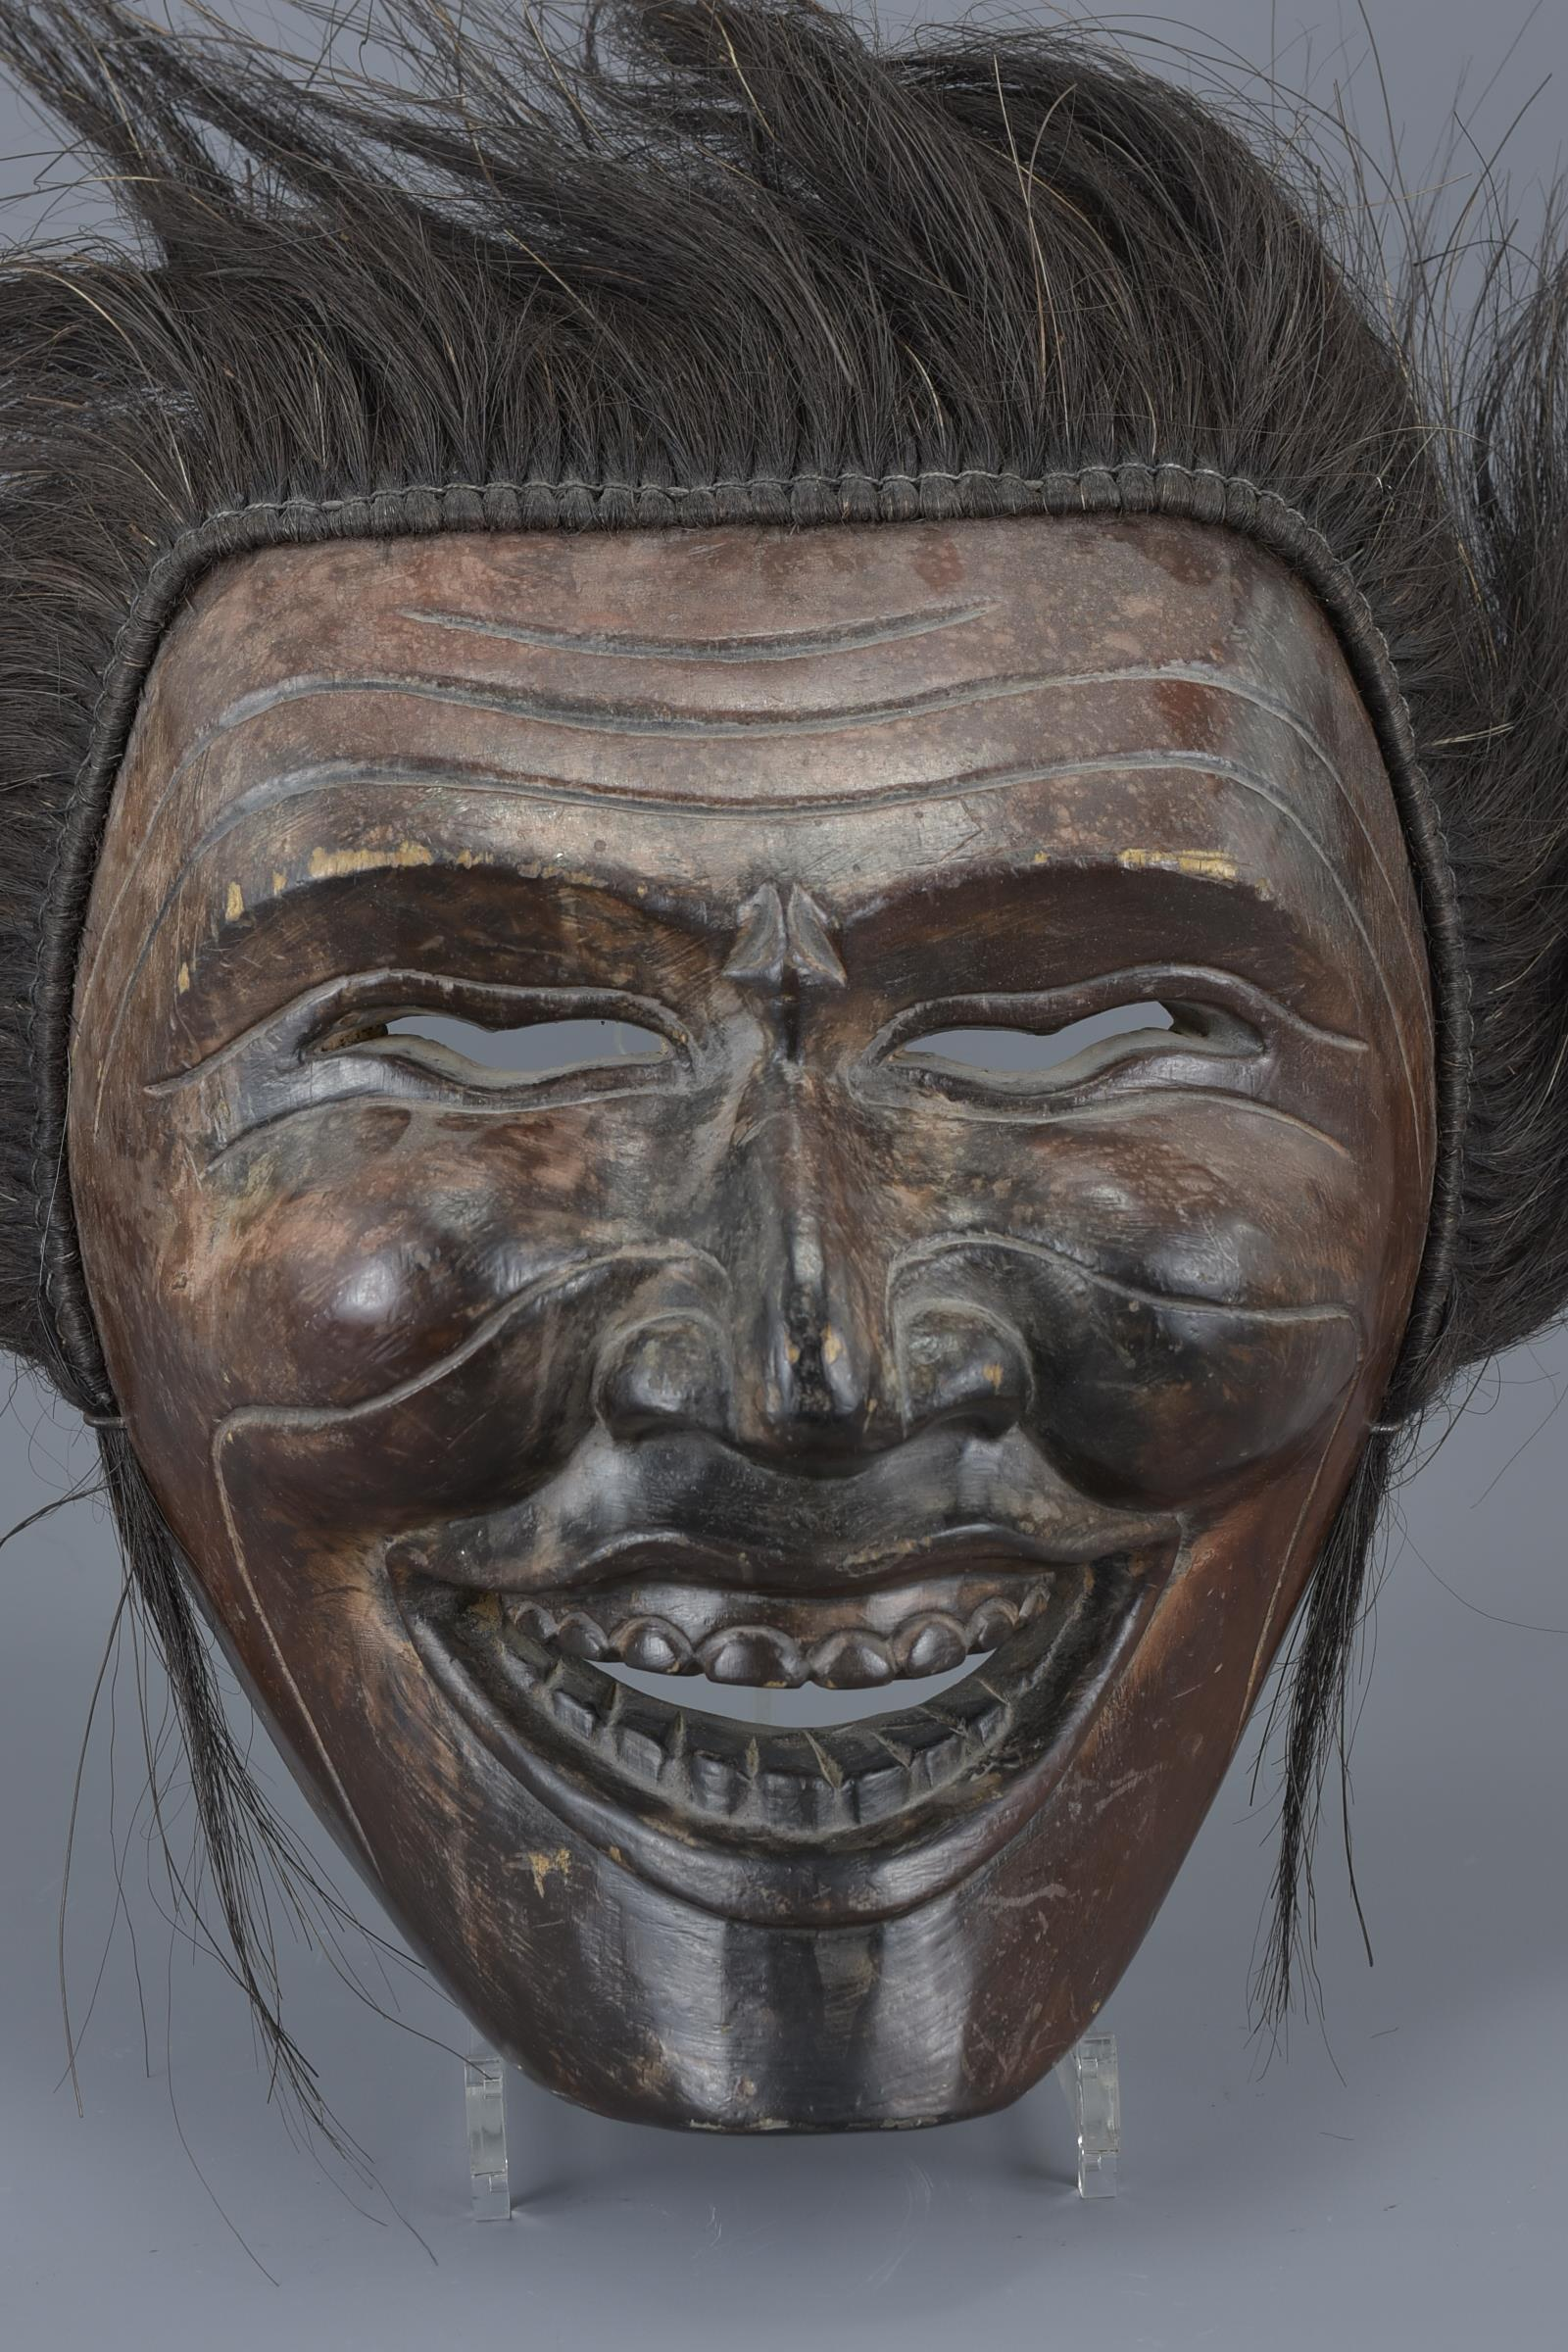 Lot 25 - A large Japanese carved wooden ceremonial mask. 29cm x 25cm